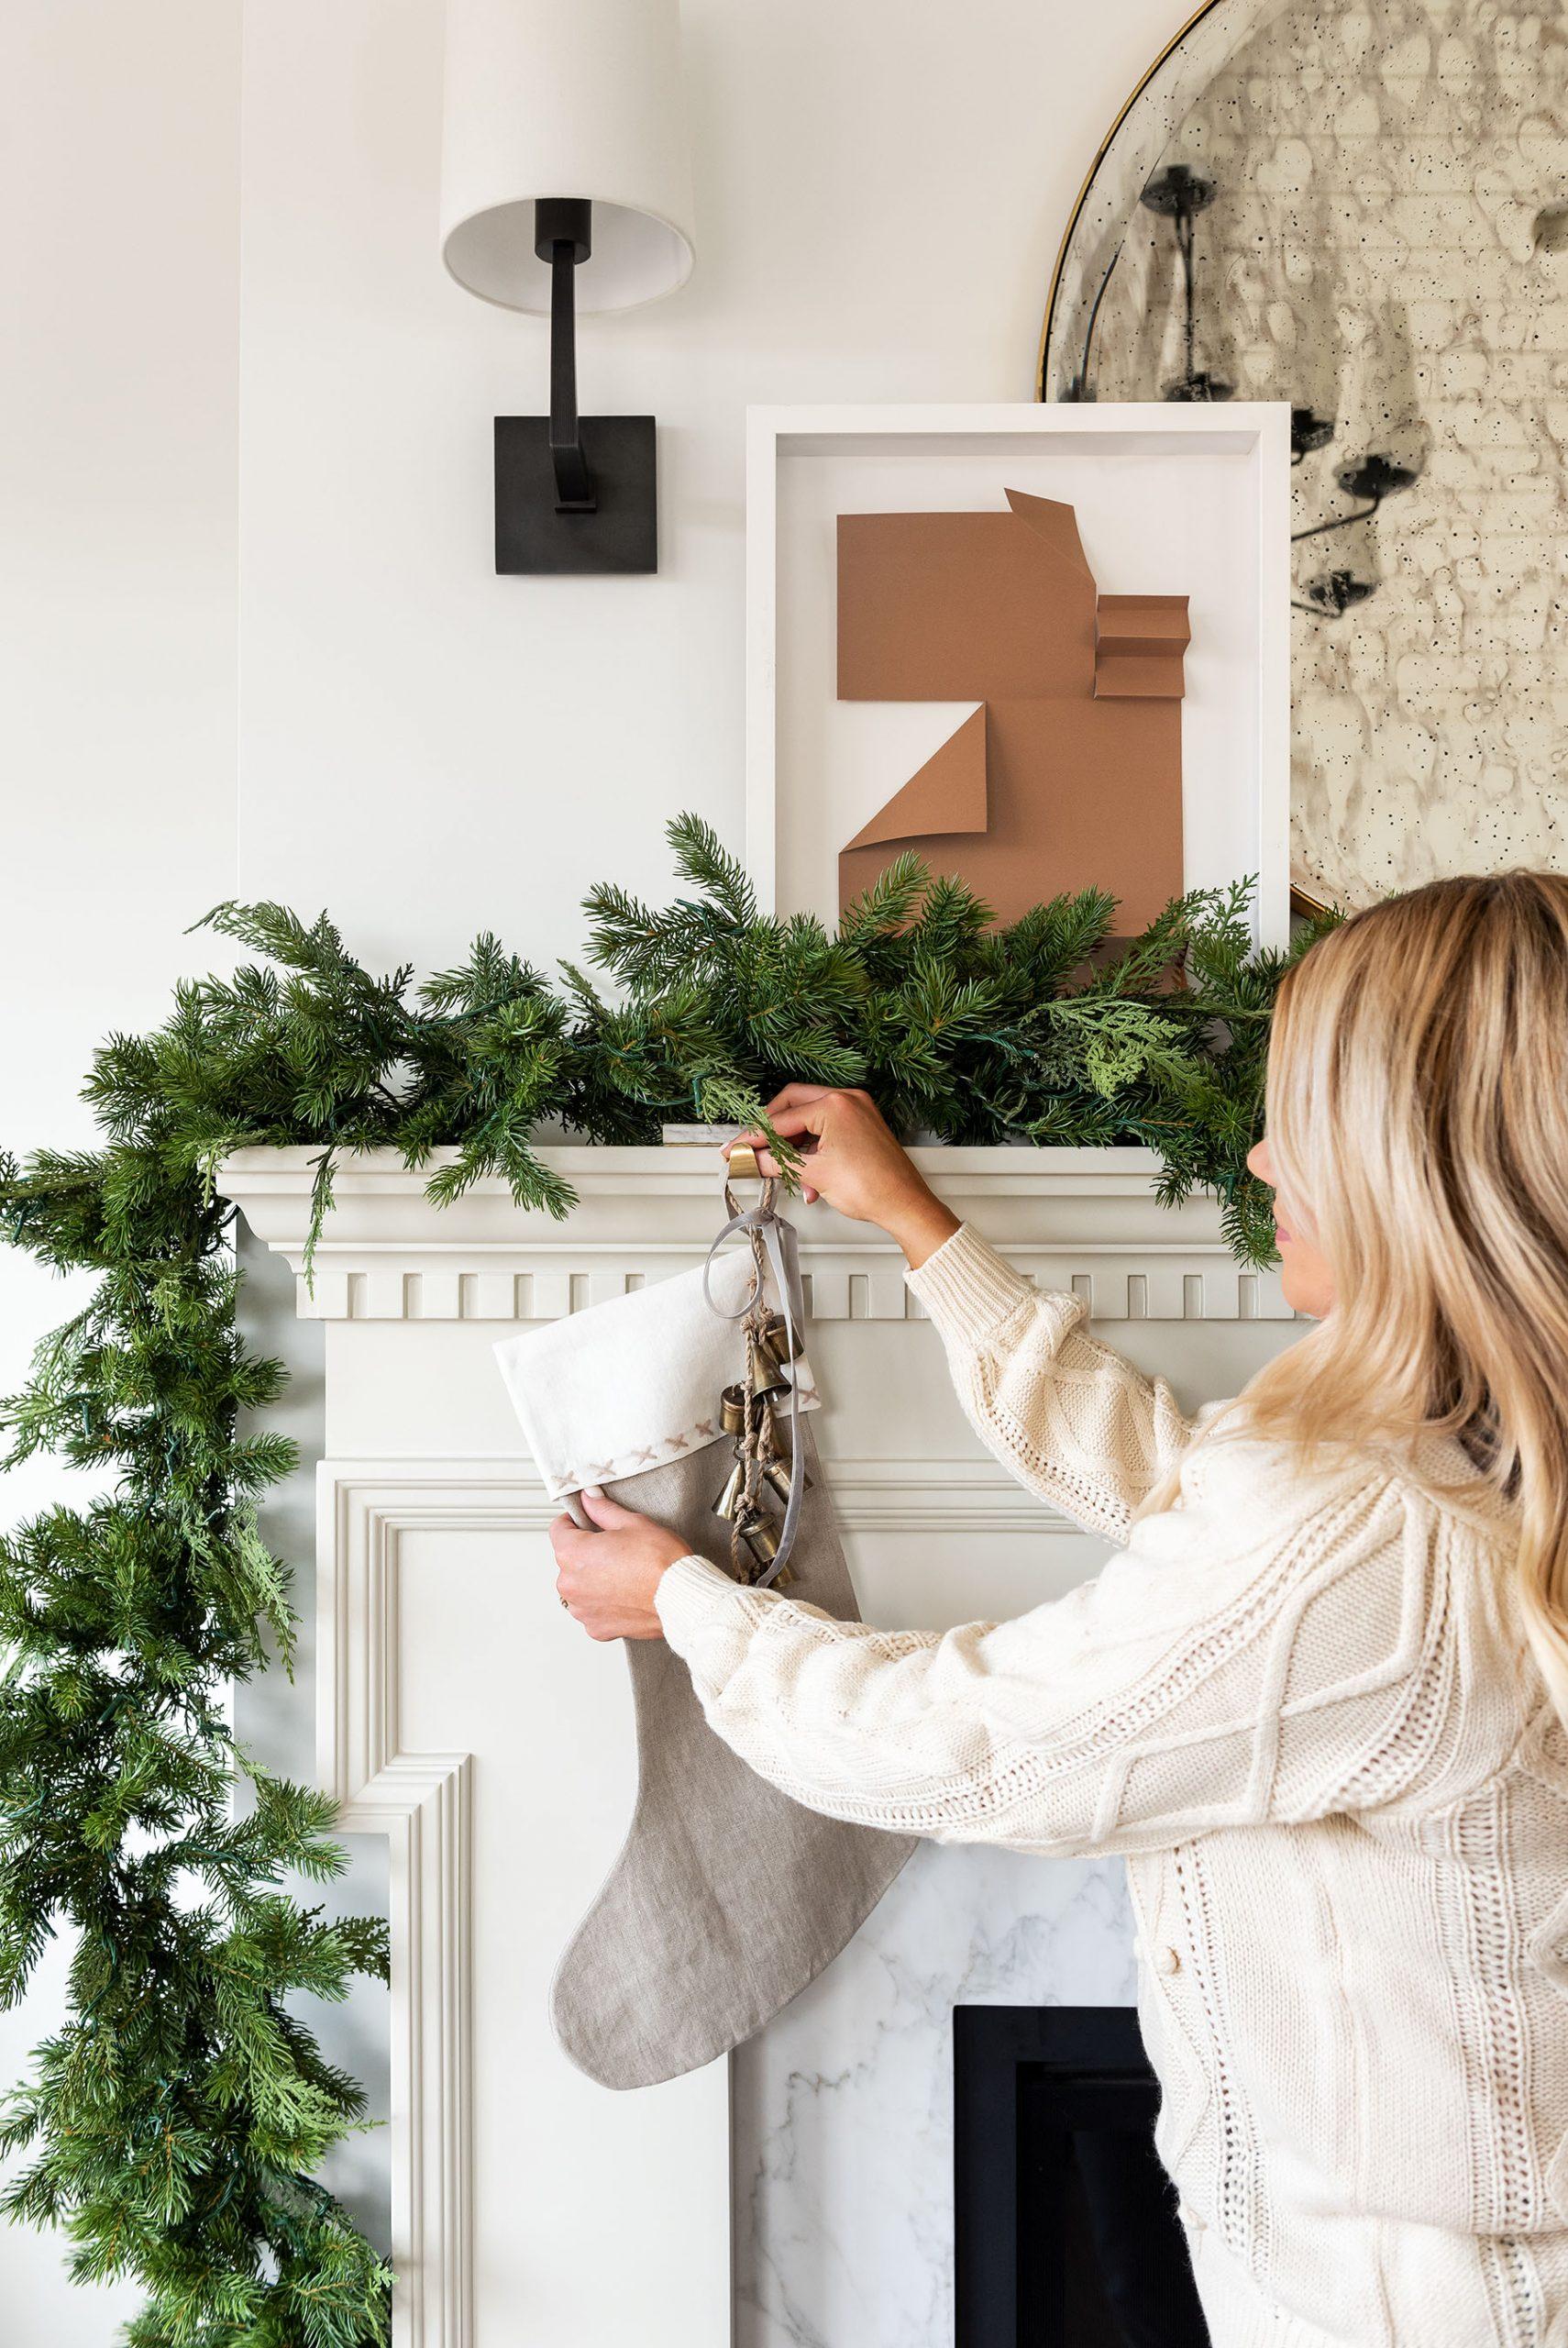 Tips for Creating a Seasonal Home